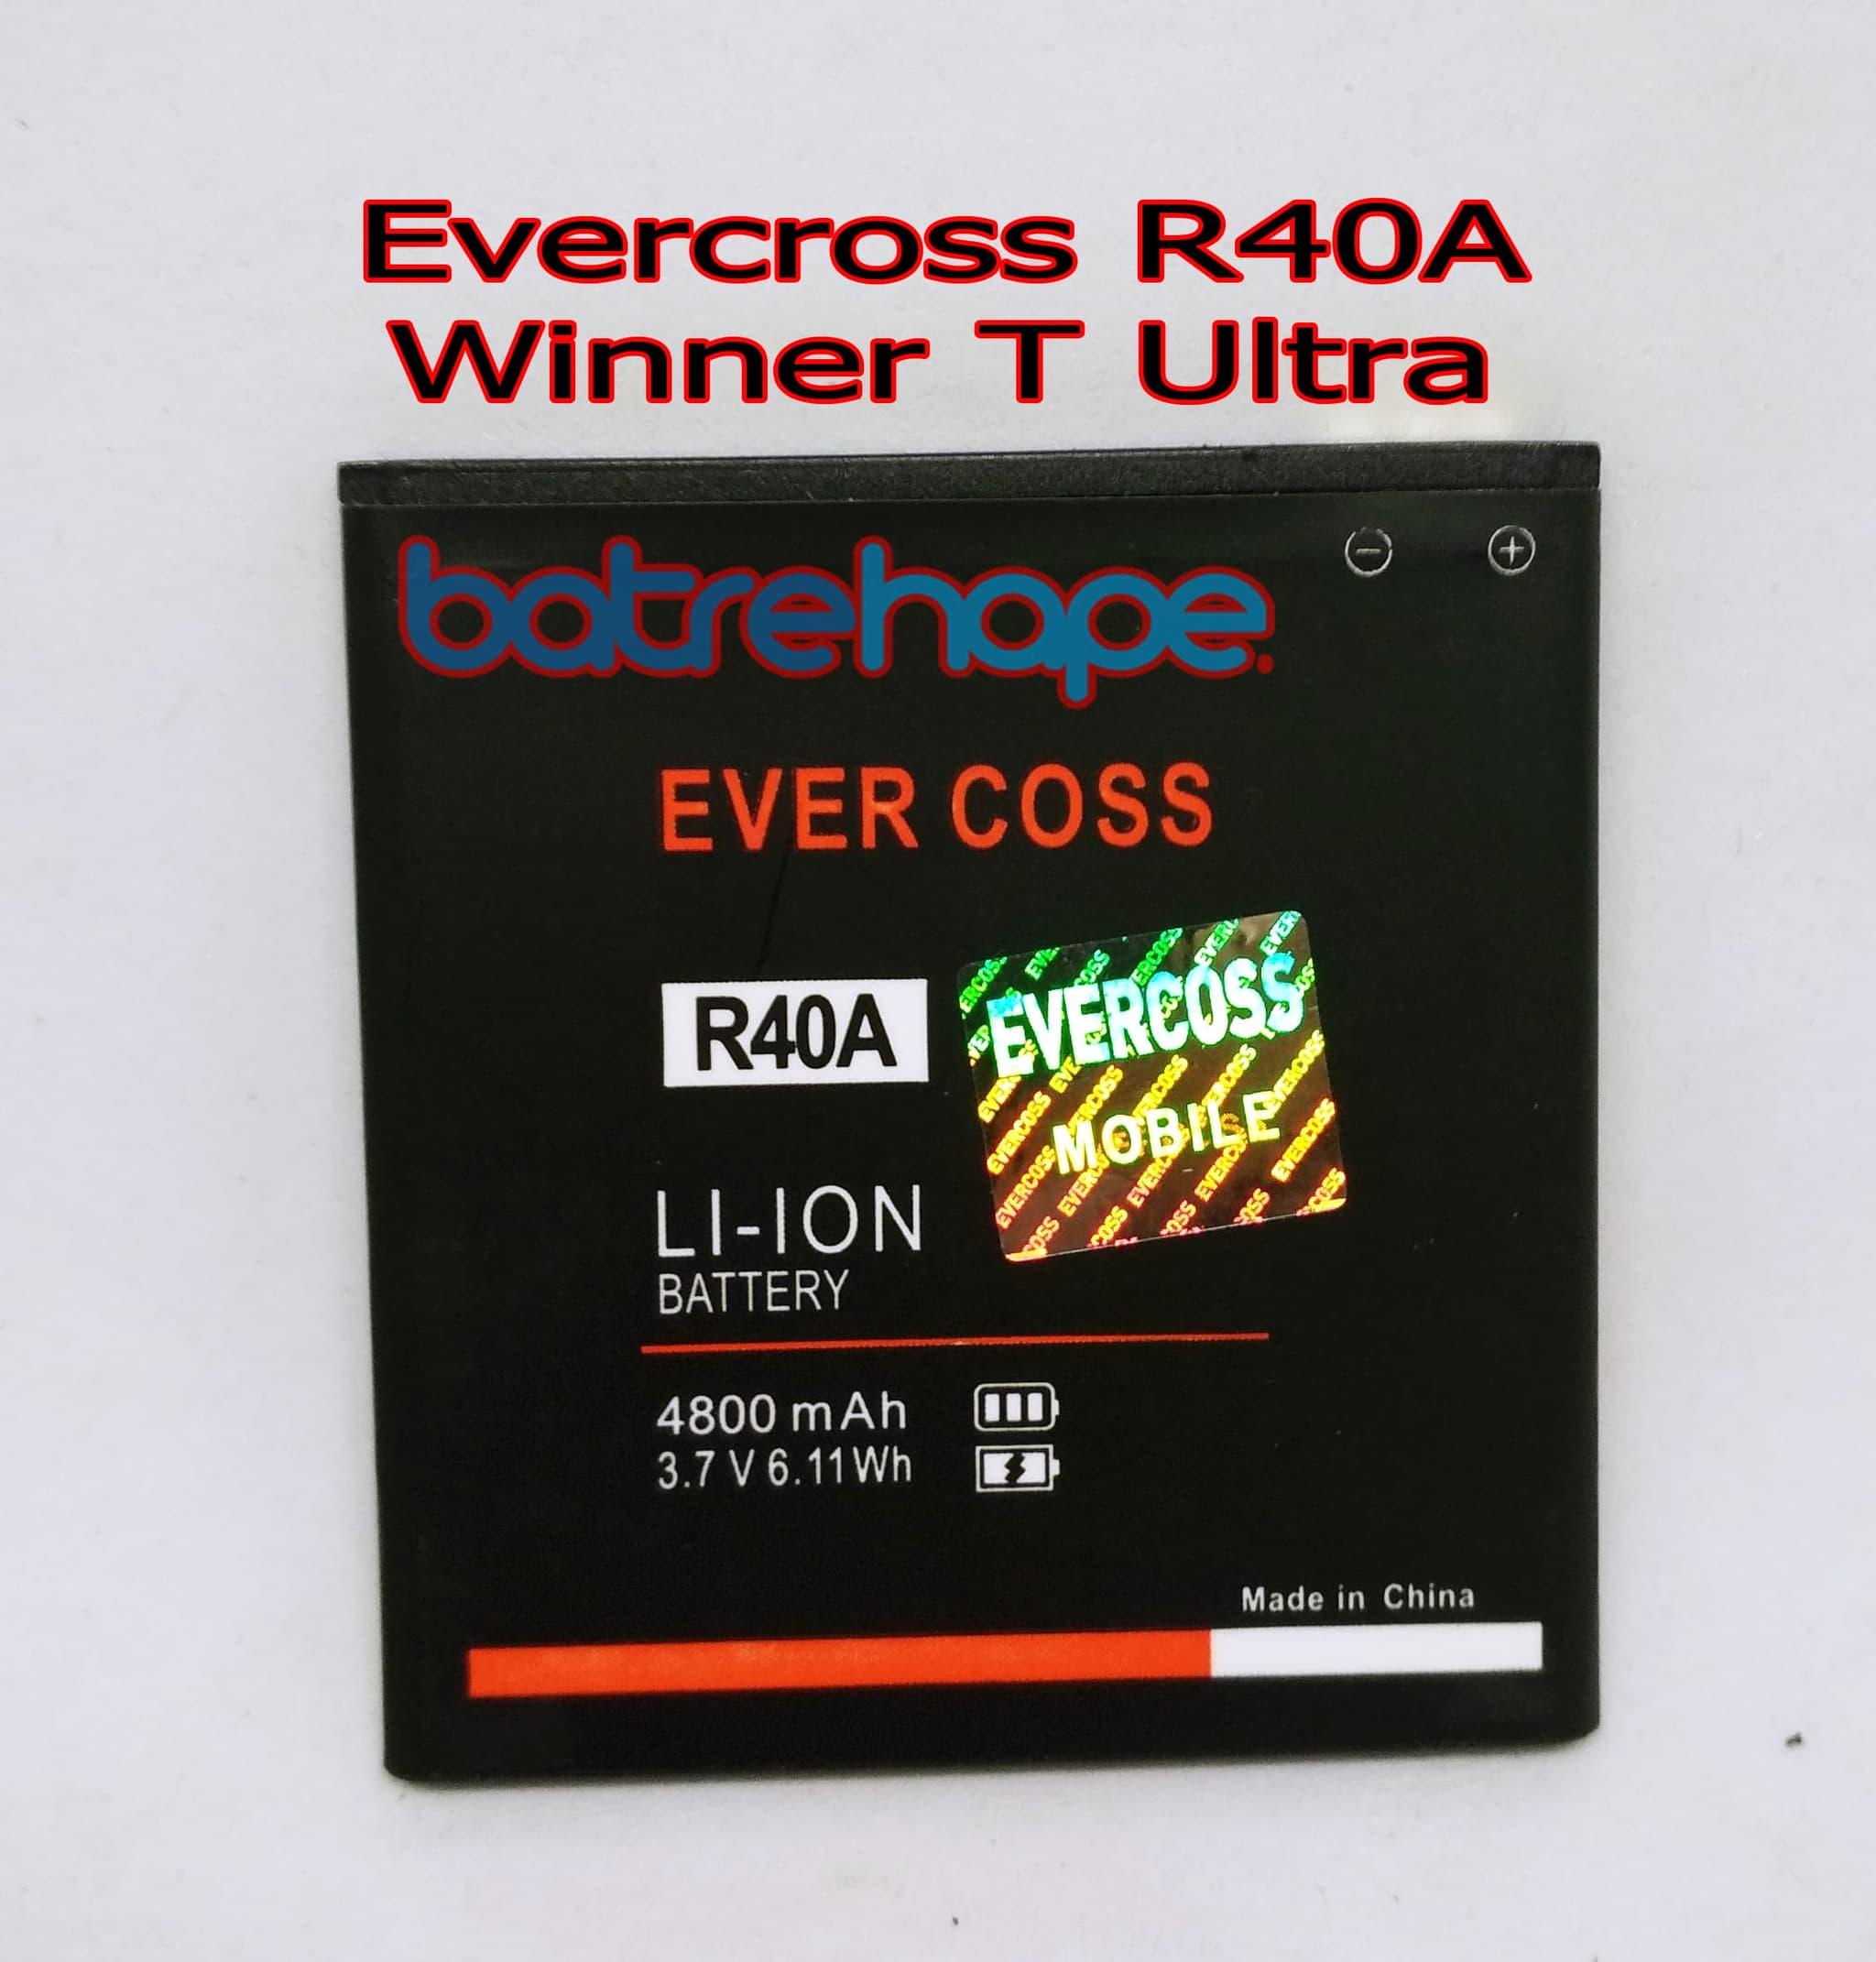 harga Baterai Battery Cross R40a Evercross Winner T Ultra R - 40a R 40a Blanja.com